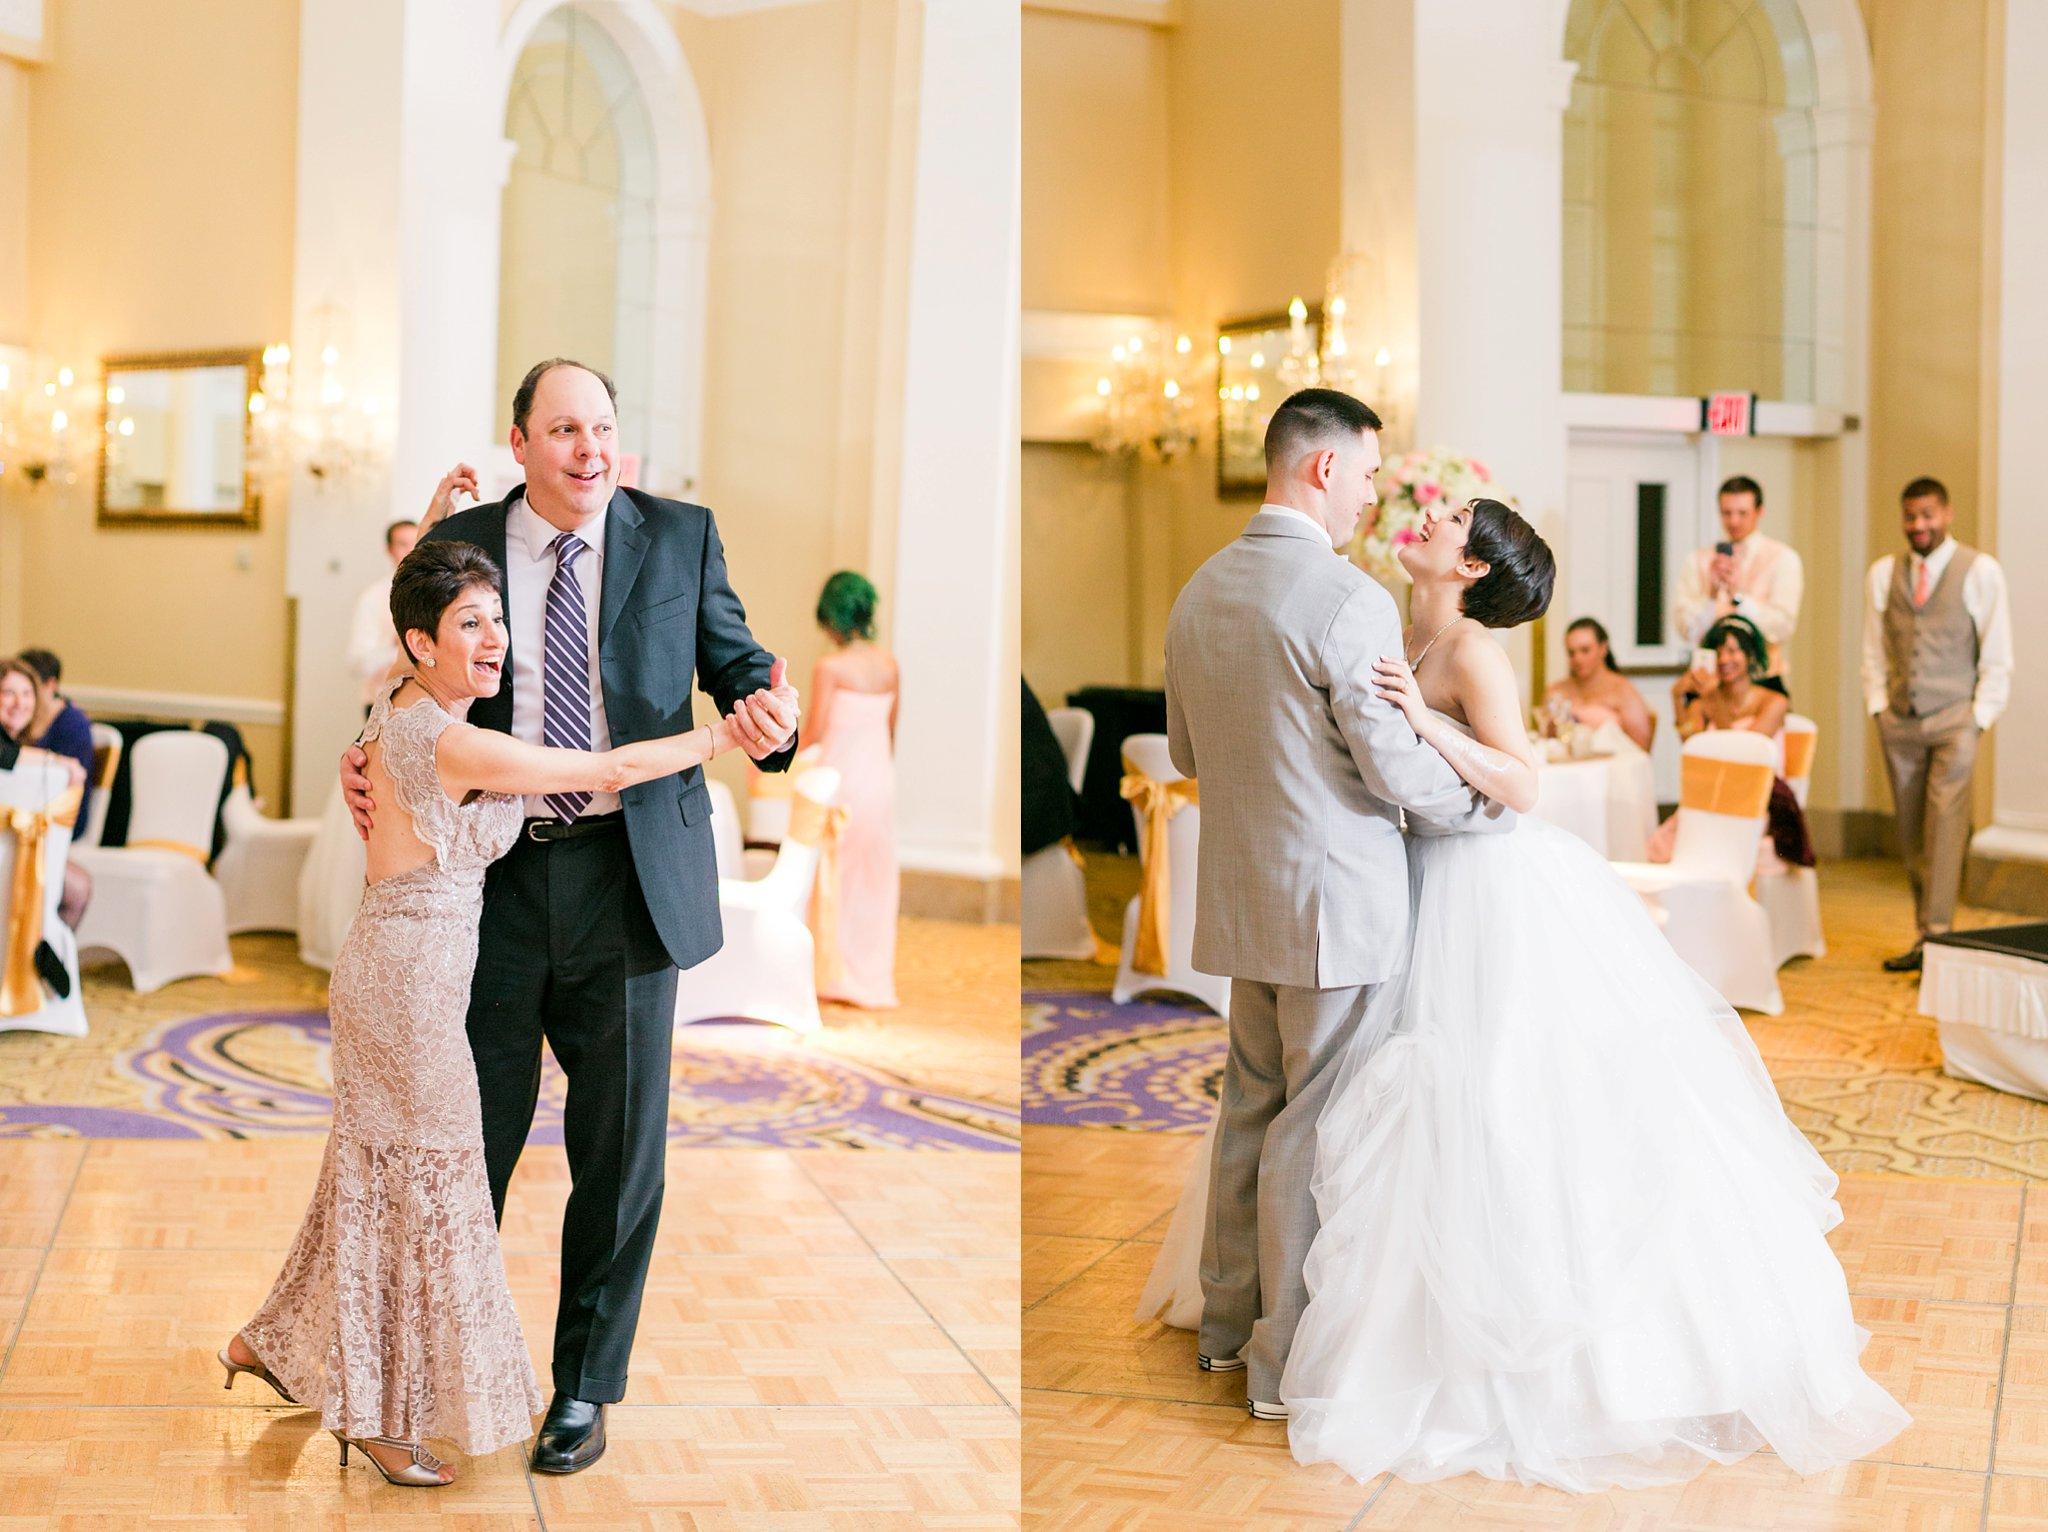 mayflower hotel wedding photos washington dc tori amp tyler